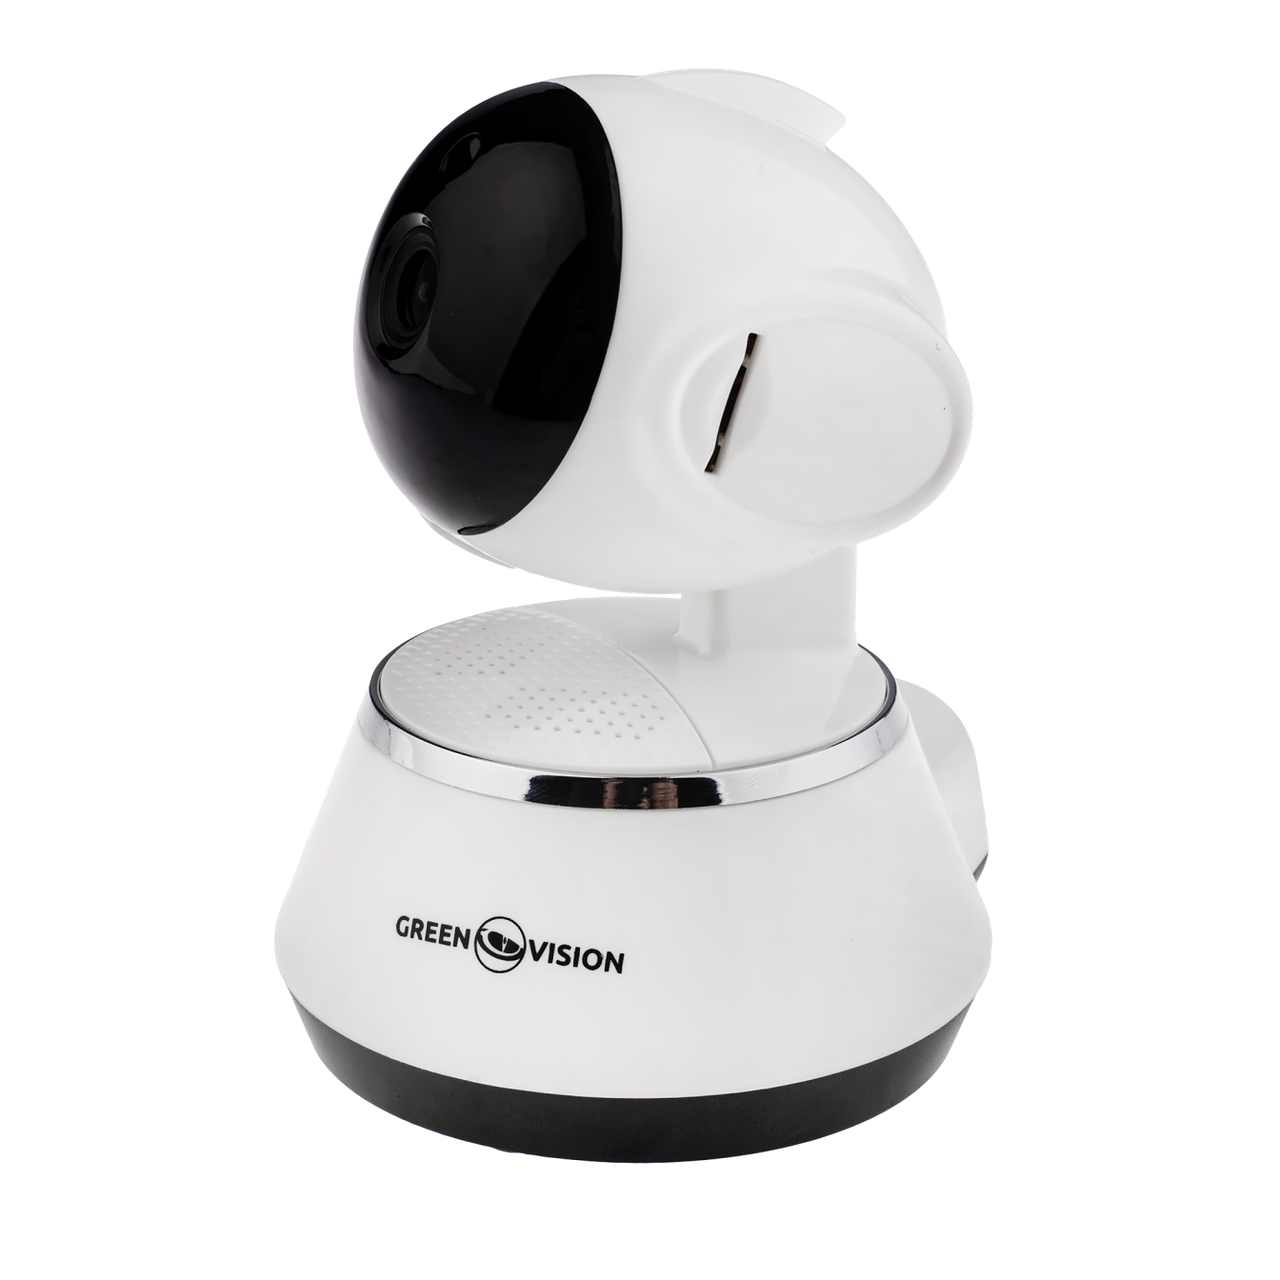 УЦ Беспроводная поворотная камера GV-087-GM-DIG10-10 PTZ 720p